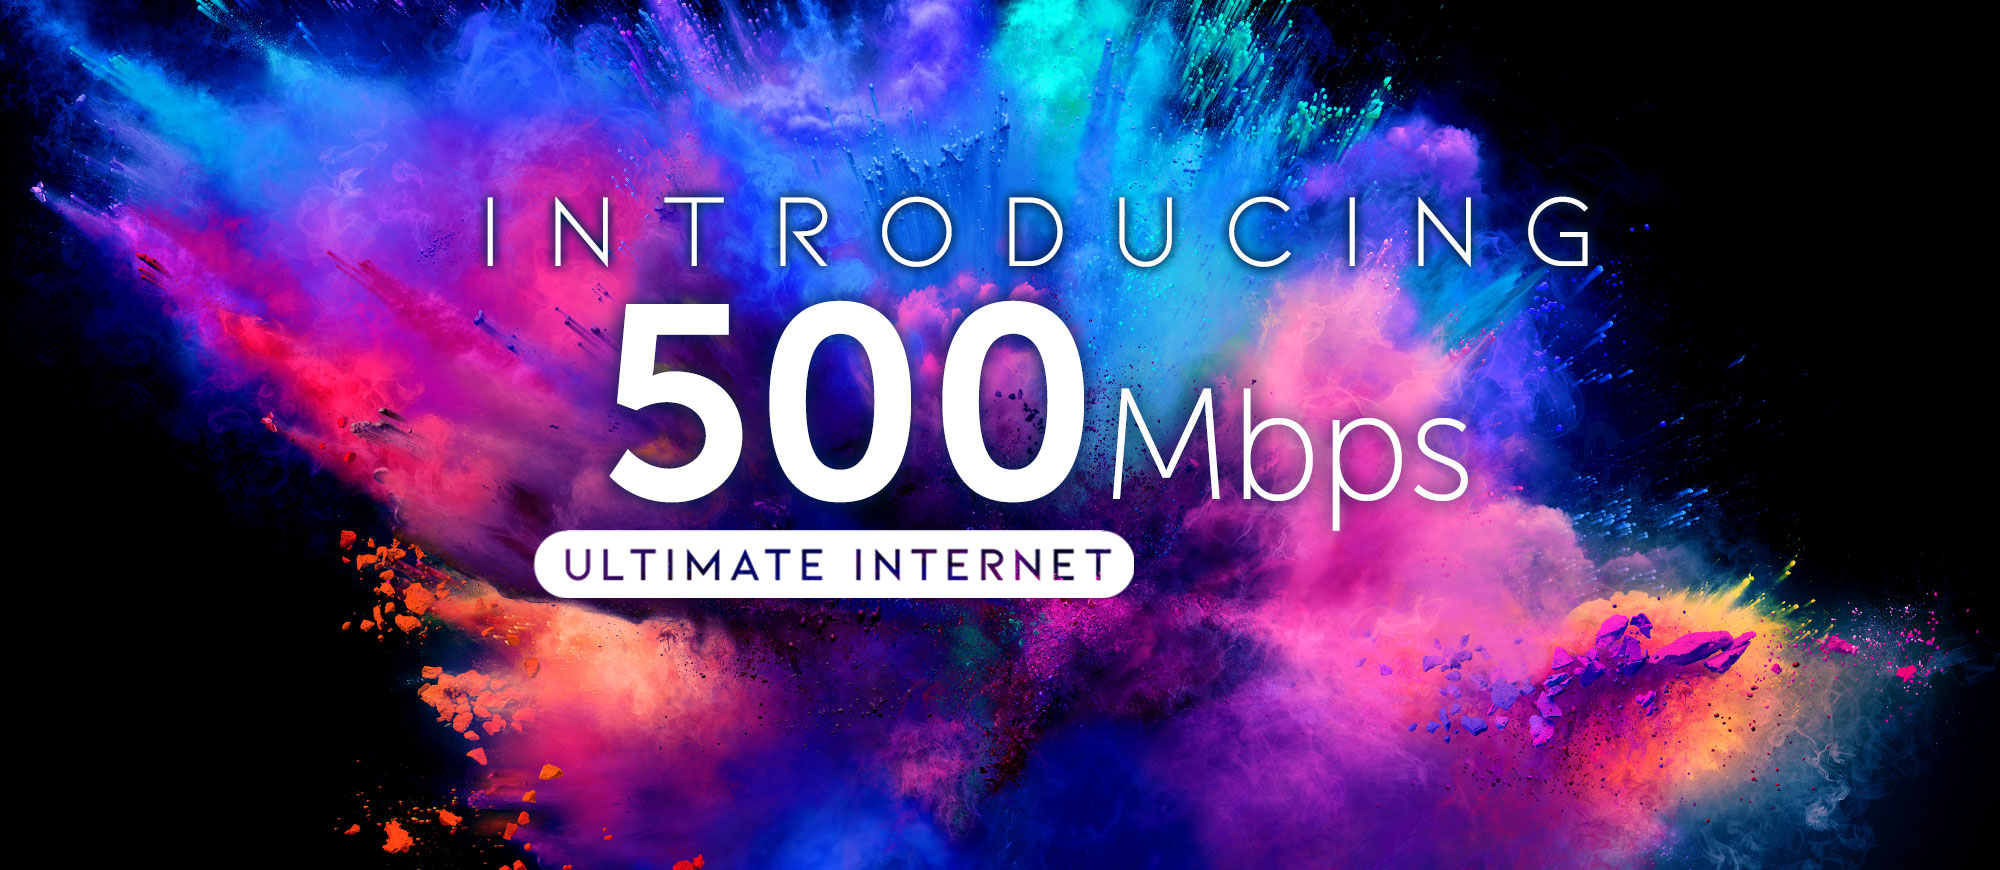 Introducing 500 M Service